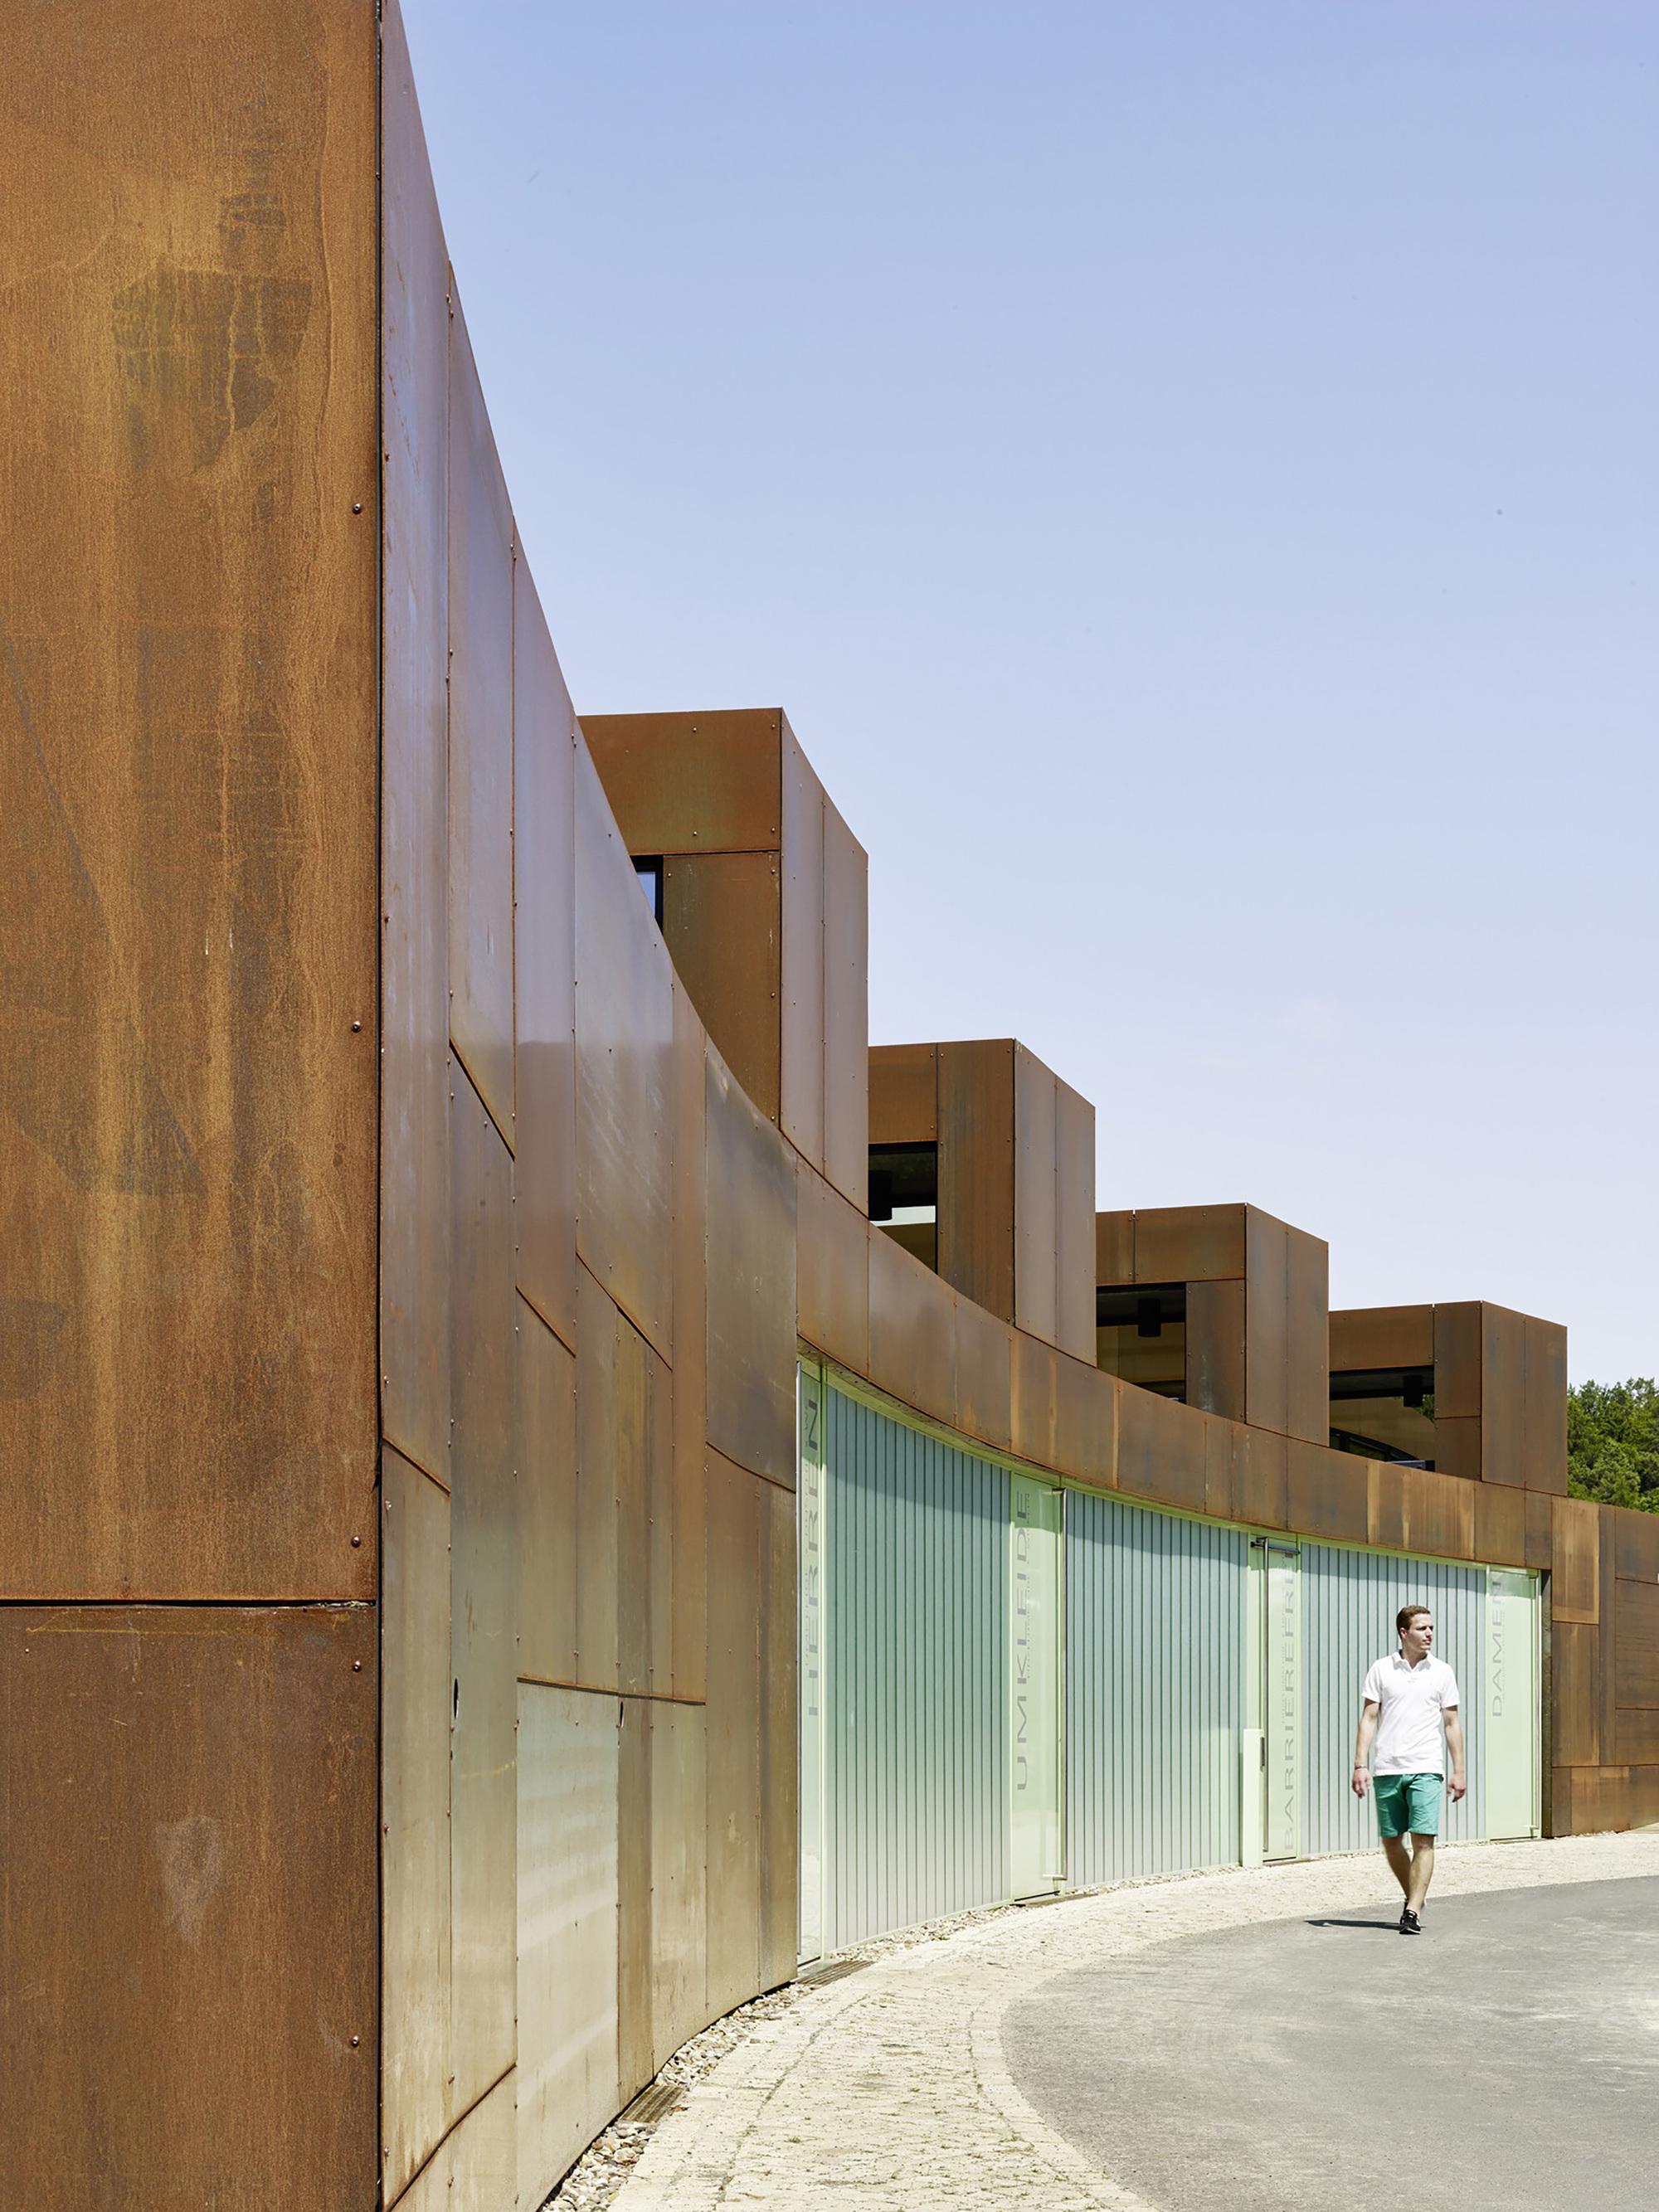 Galeria de Banheiro Público / Müntinga   Puy Architekten 1 #3C5C8F 2000 2667